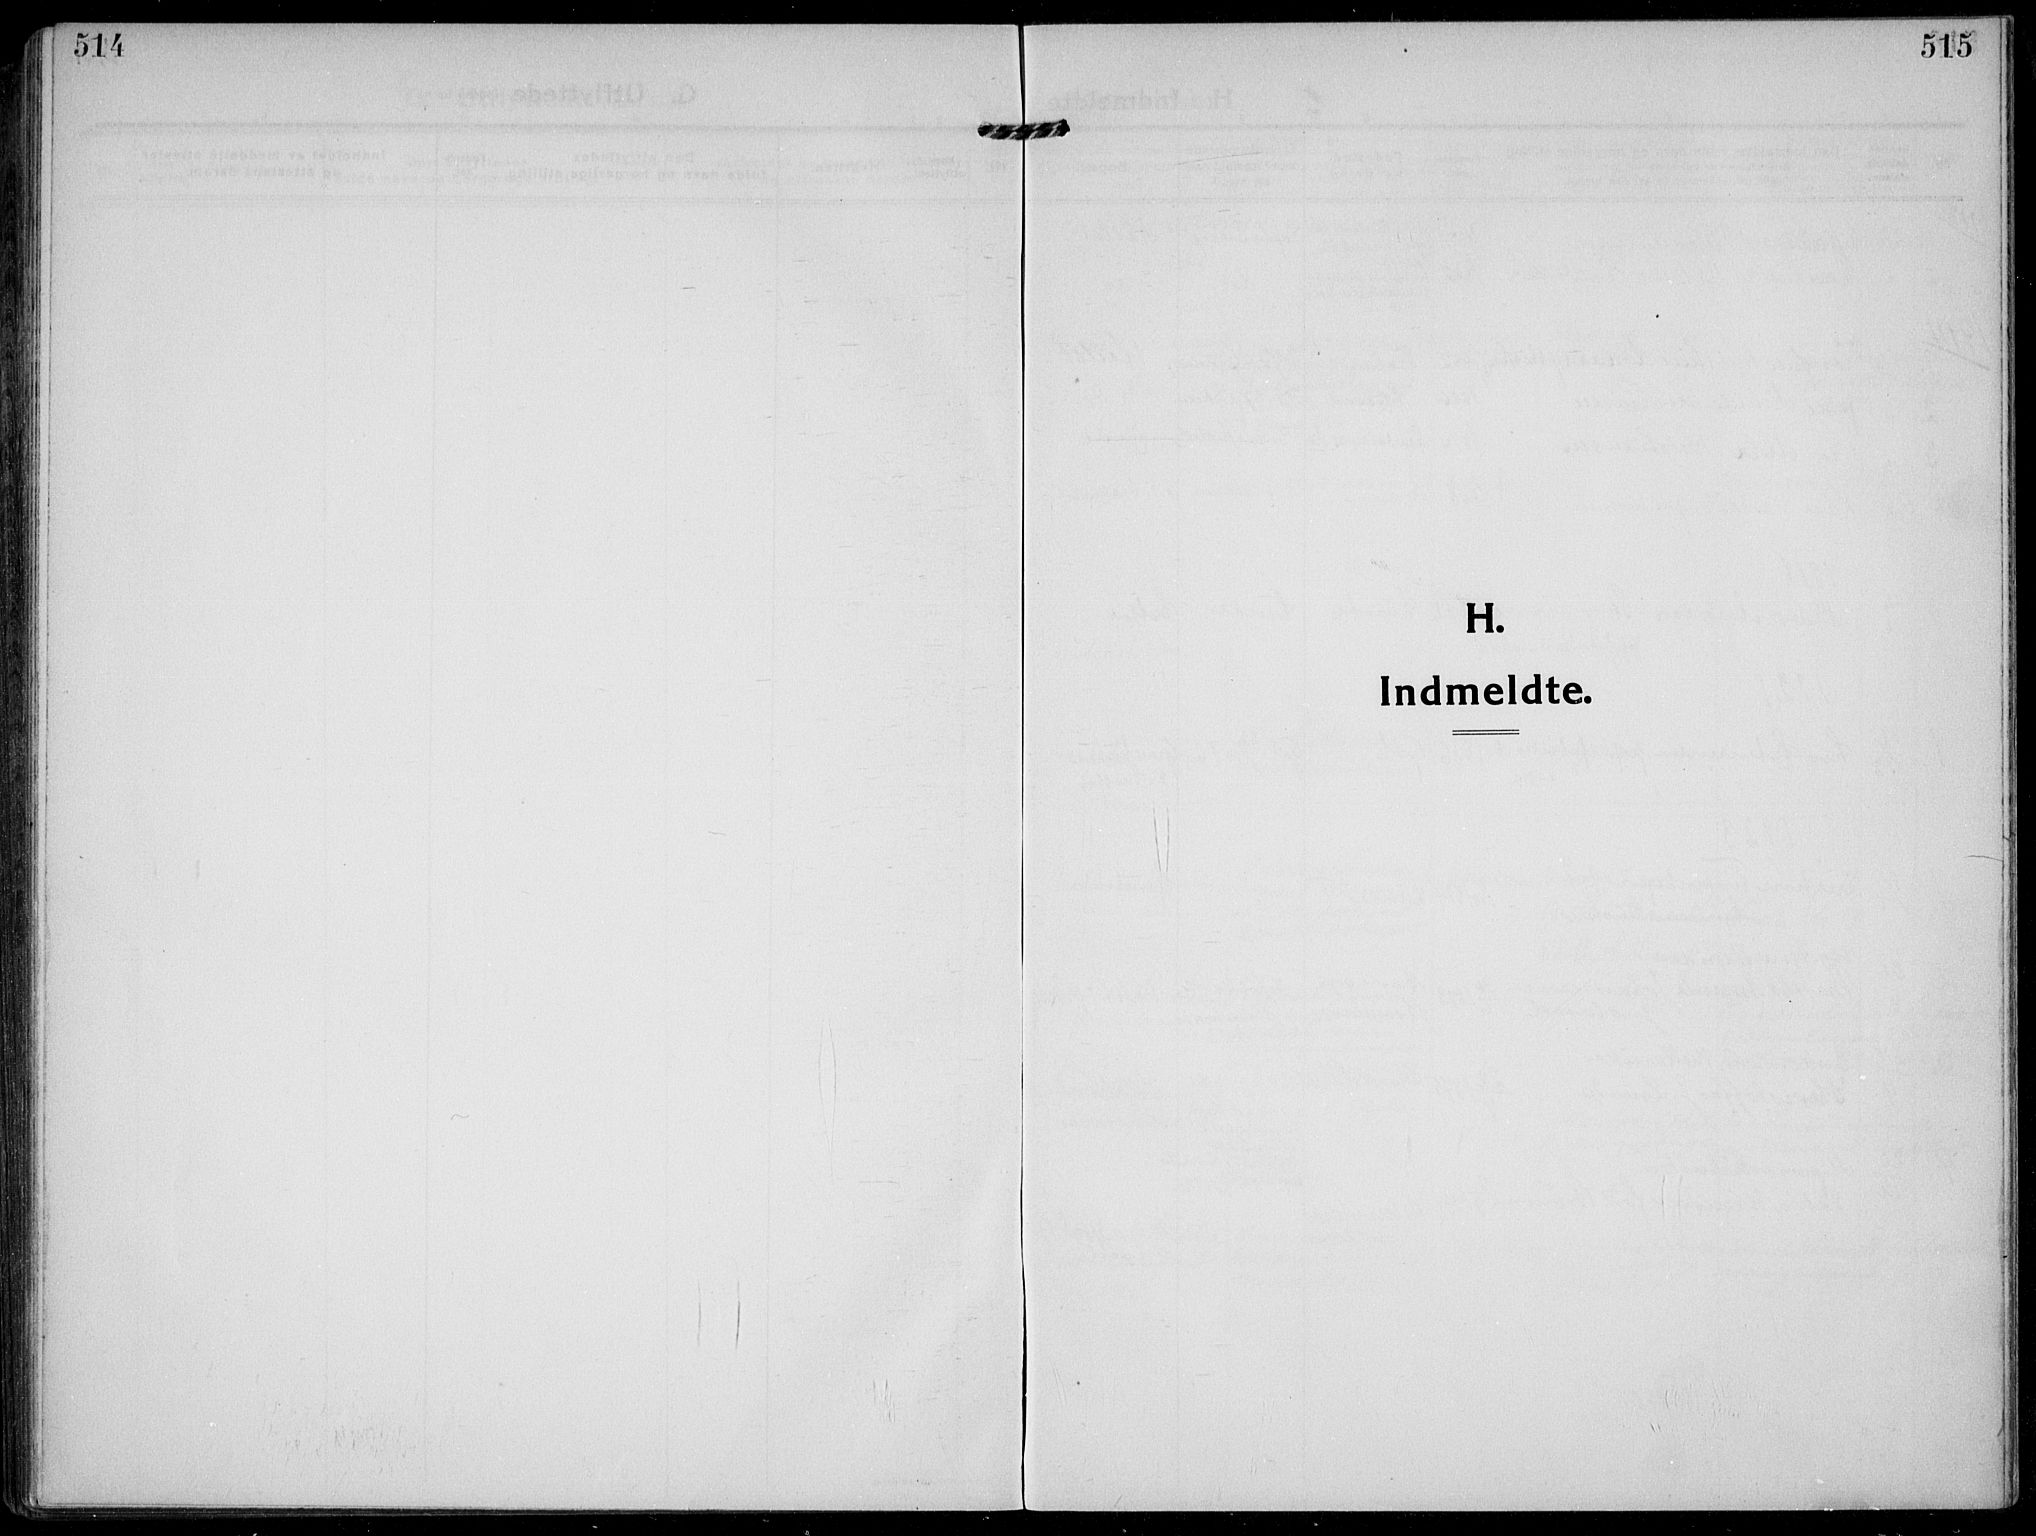 SAKO, Solum kirkebøker, F/Fb/L0004: Ministerialbok nr. II 4, 1913-1924, s. 514-515